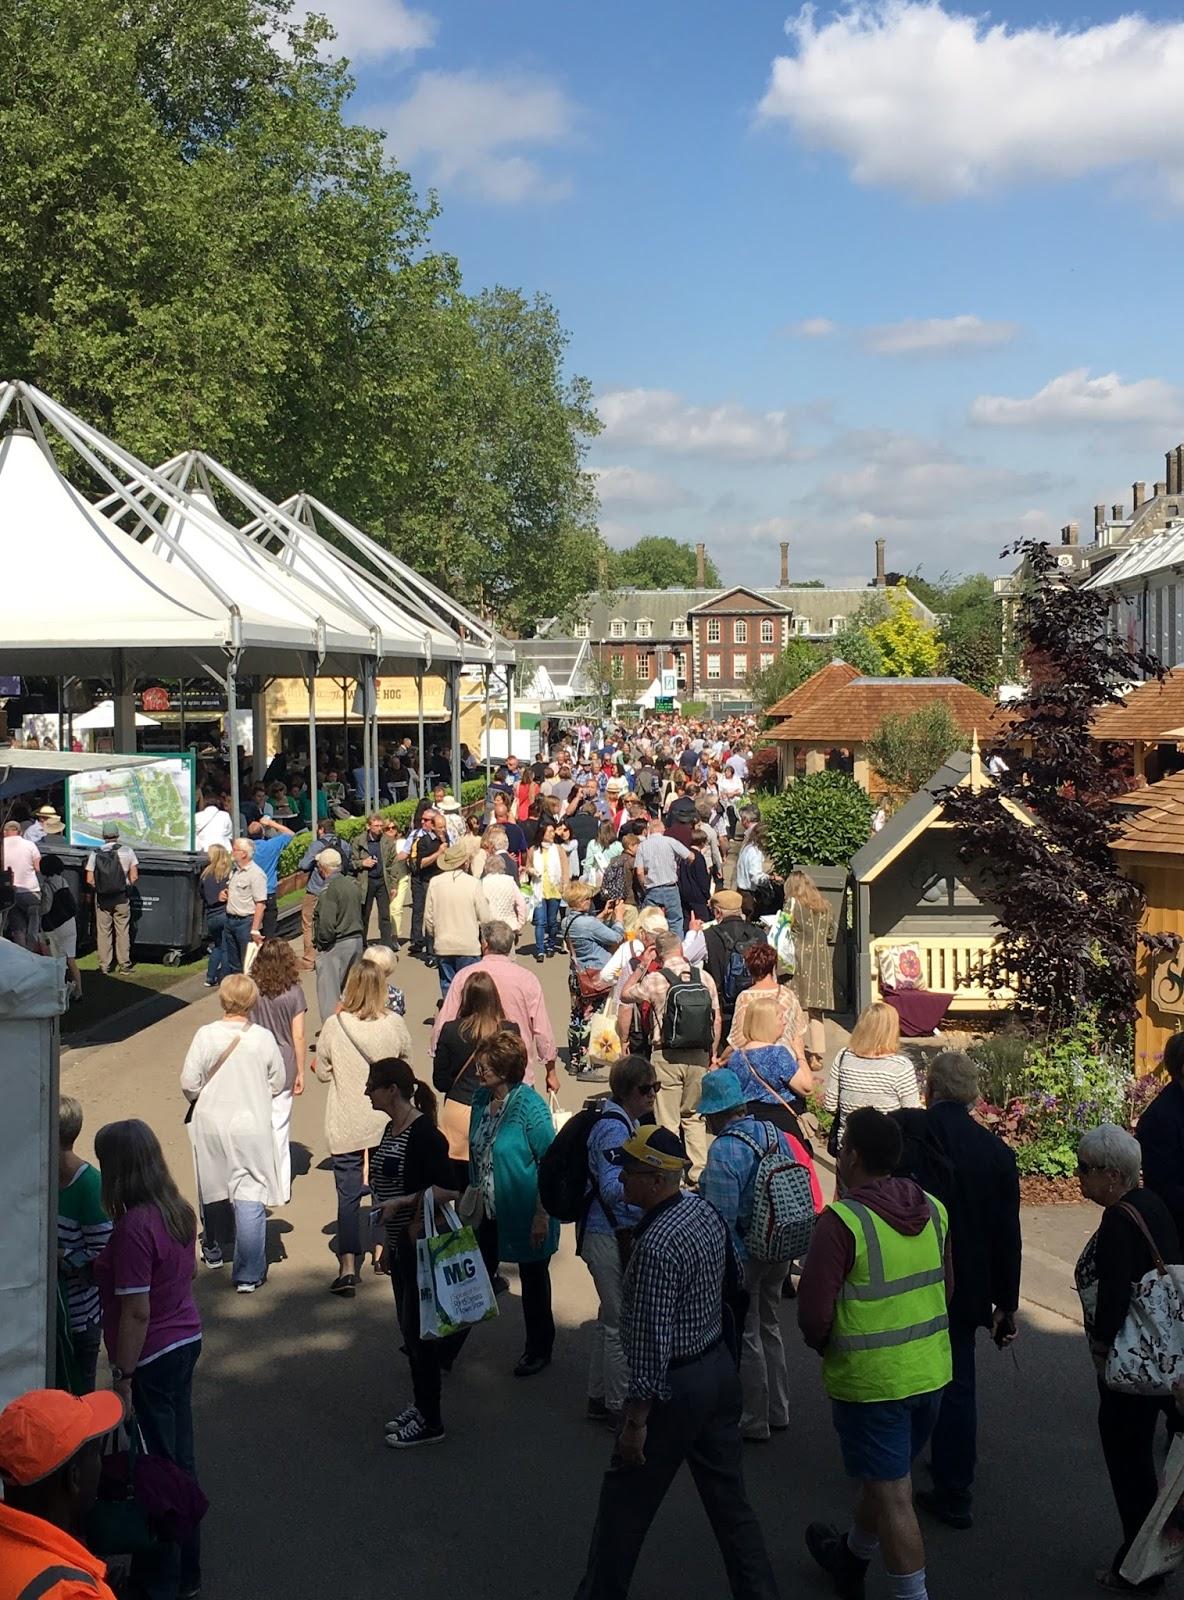 Hastings Battleaxe hits the Chelsea Flower Show.